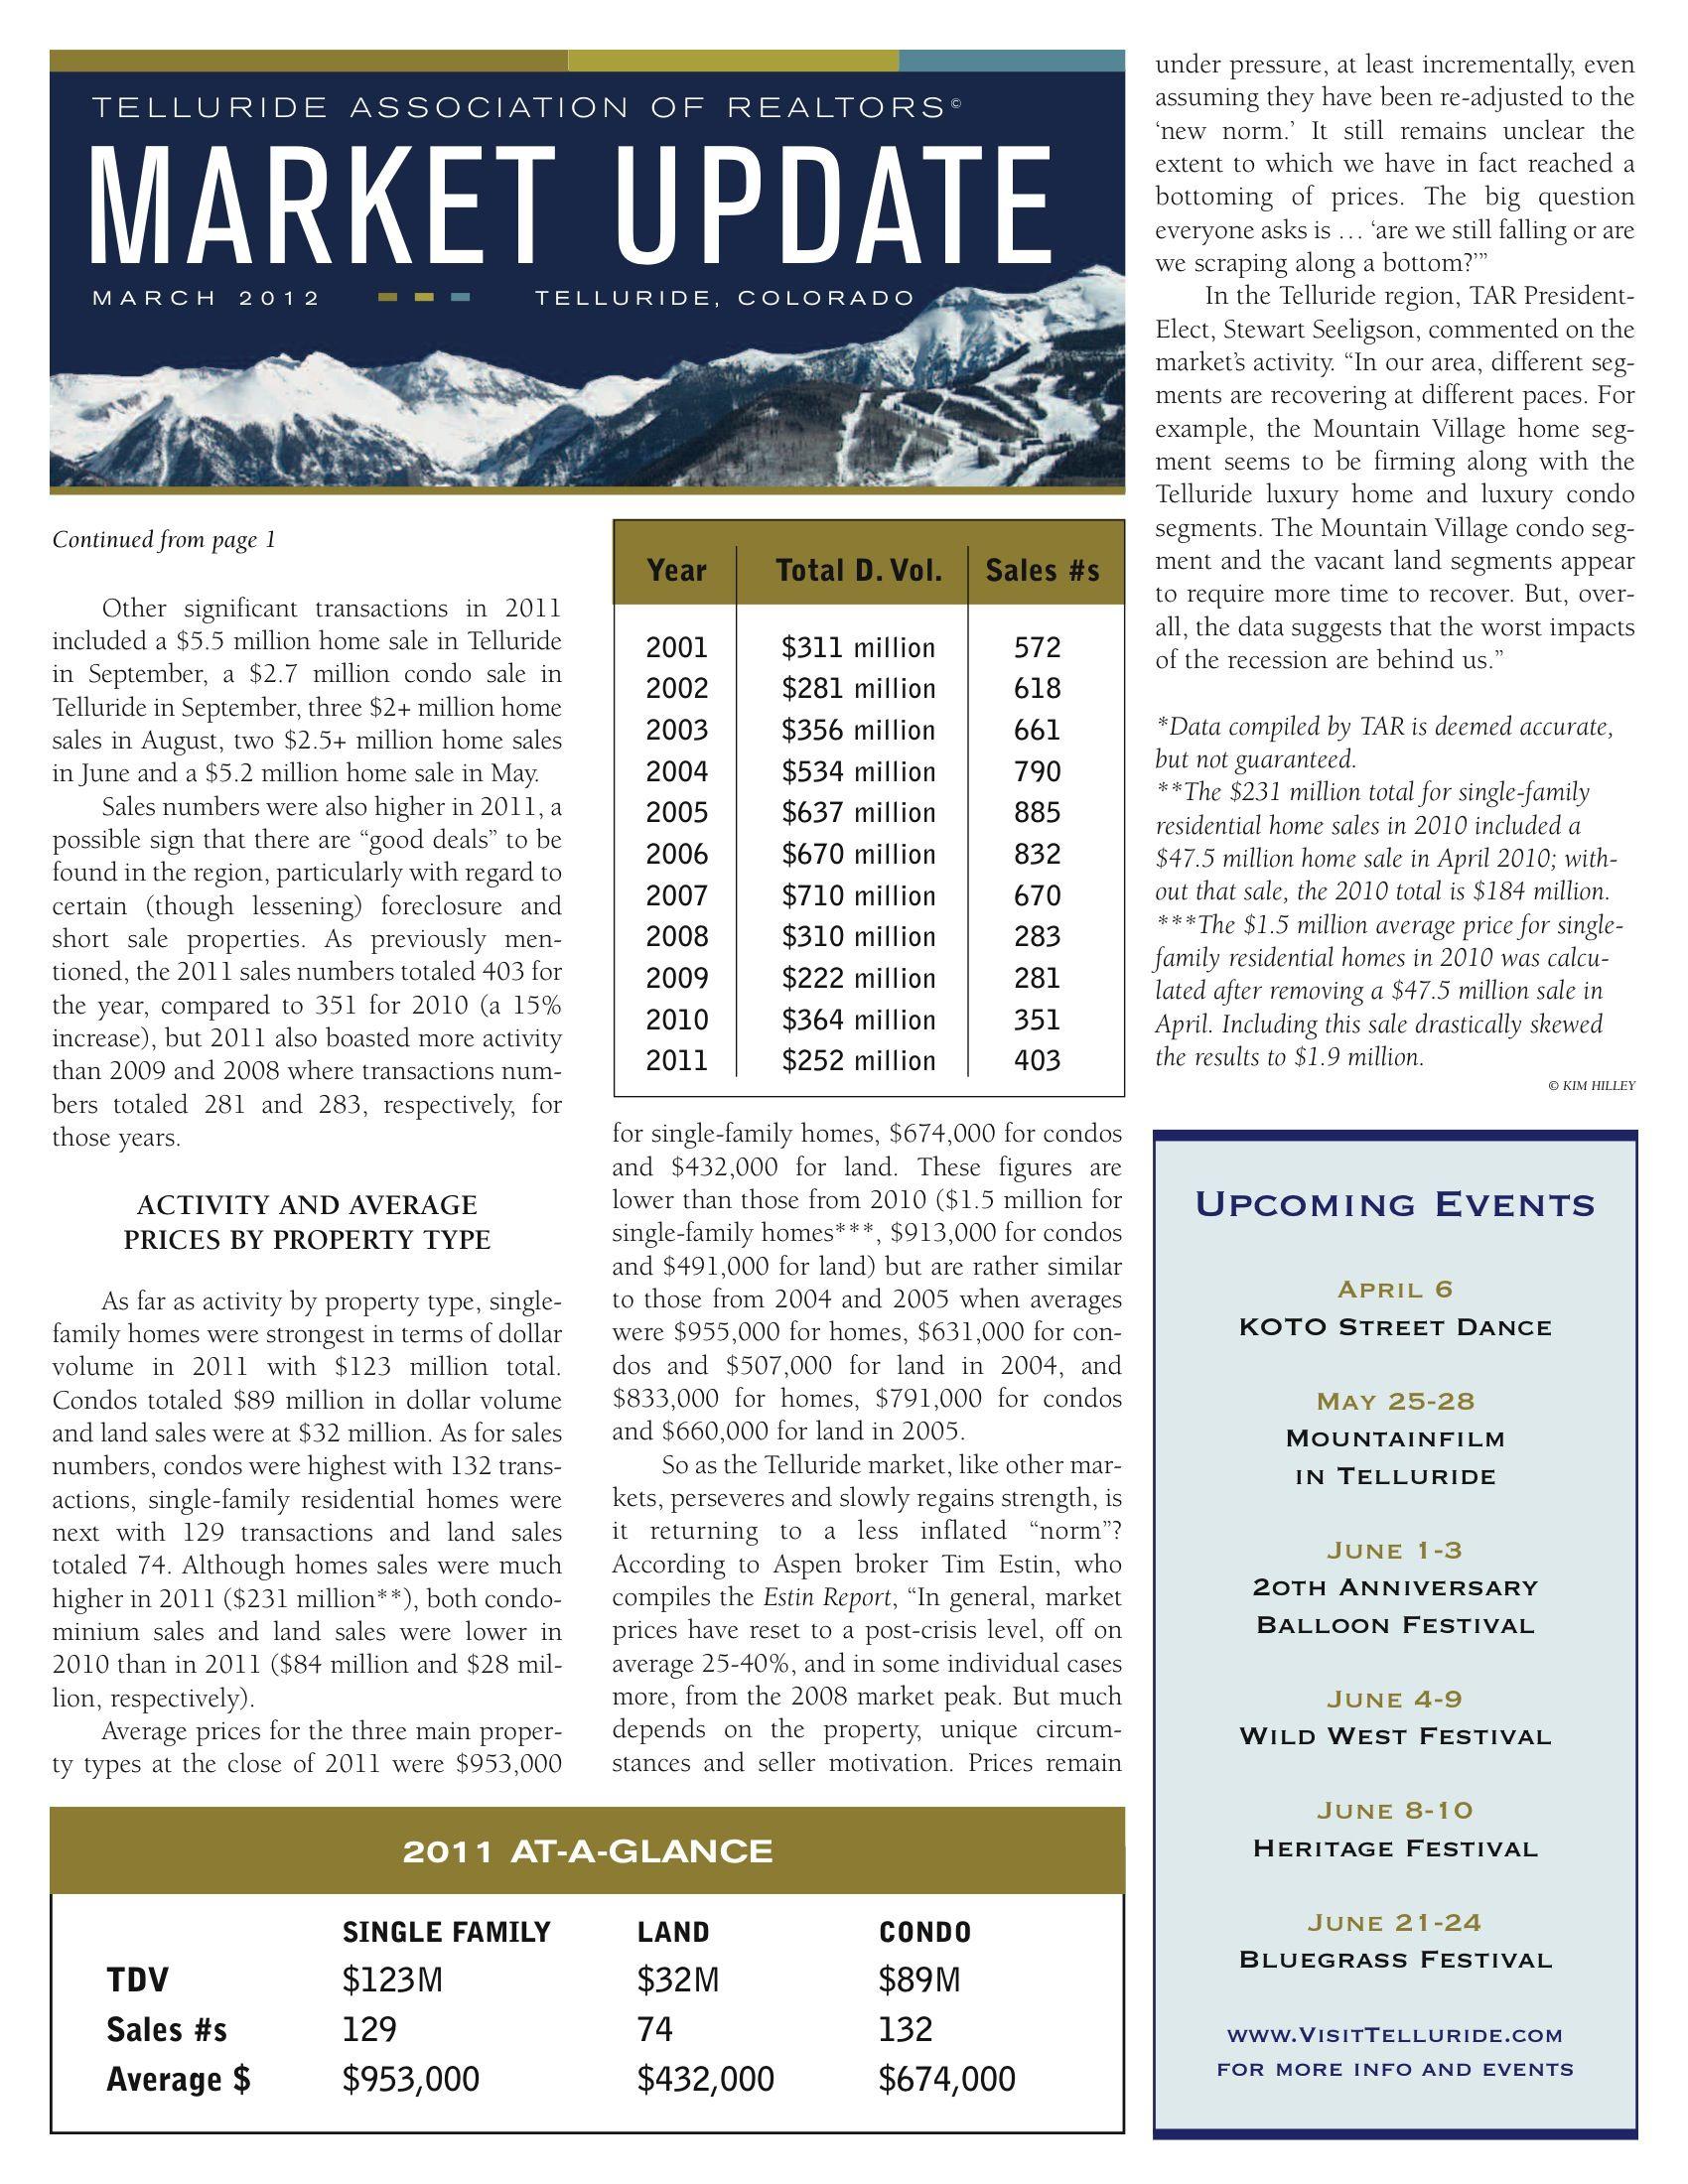 Telluride Assoc. of Realtors 1st Quarter Update Pg. 2